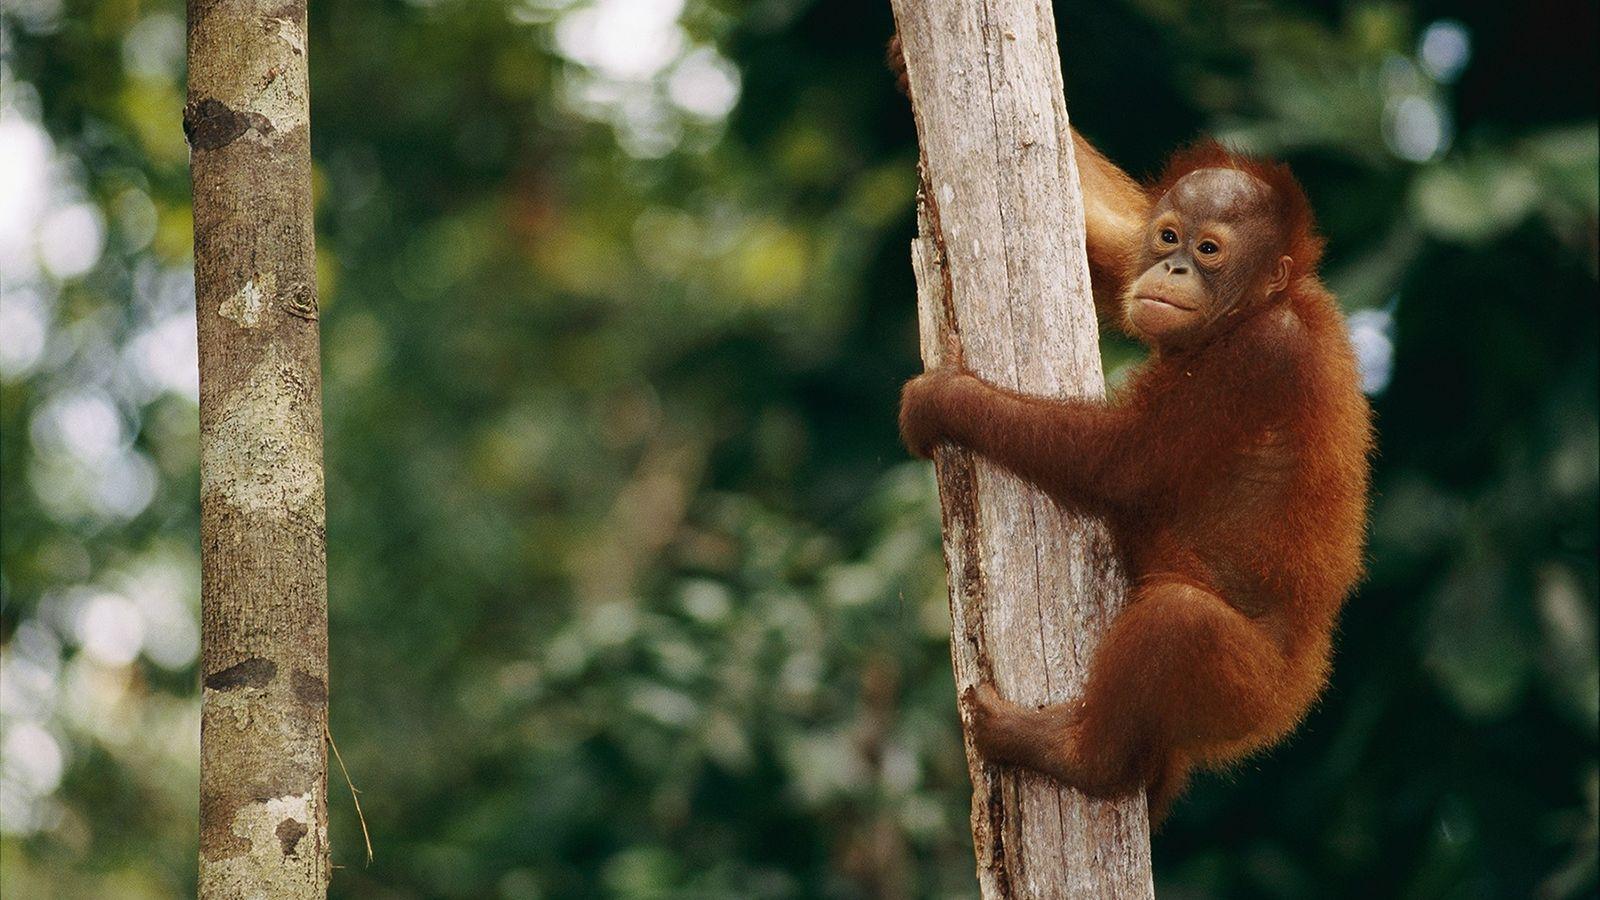 Orangutan de borneo 01